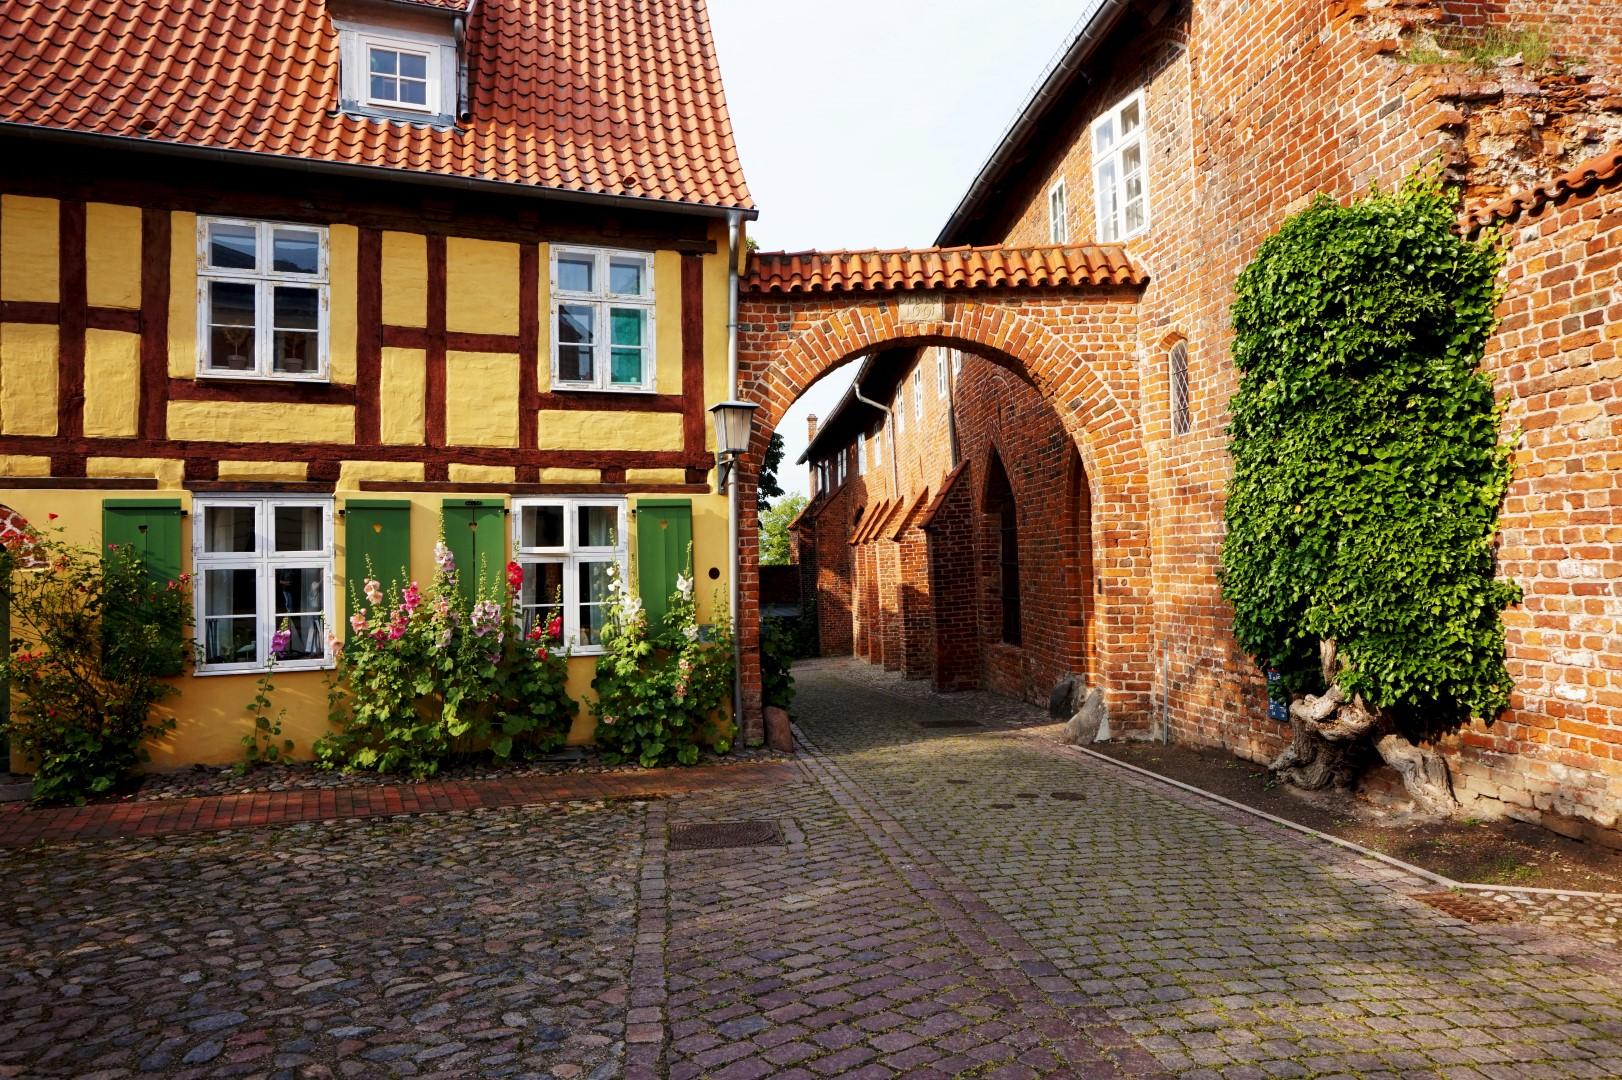 Un jour à Stralsund - City Guide - Blog voyage